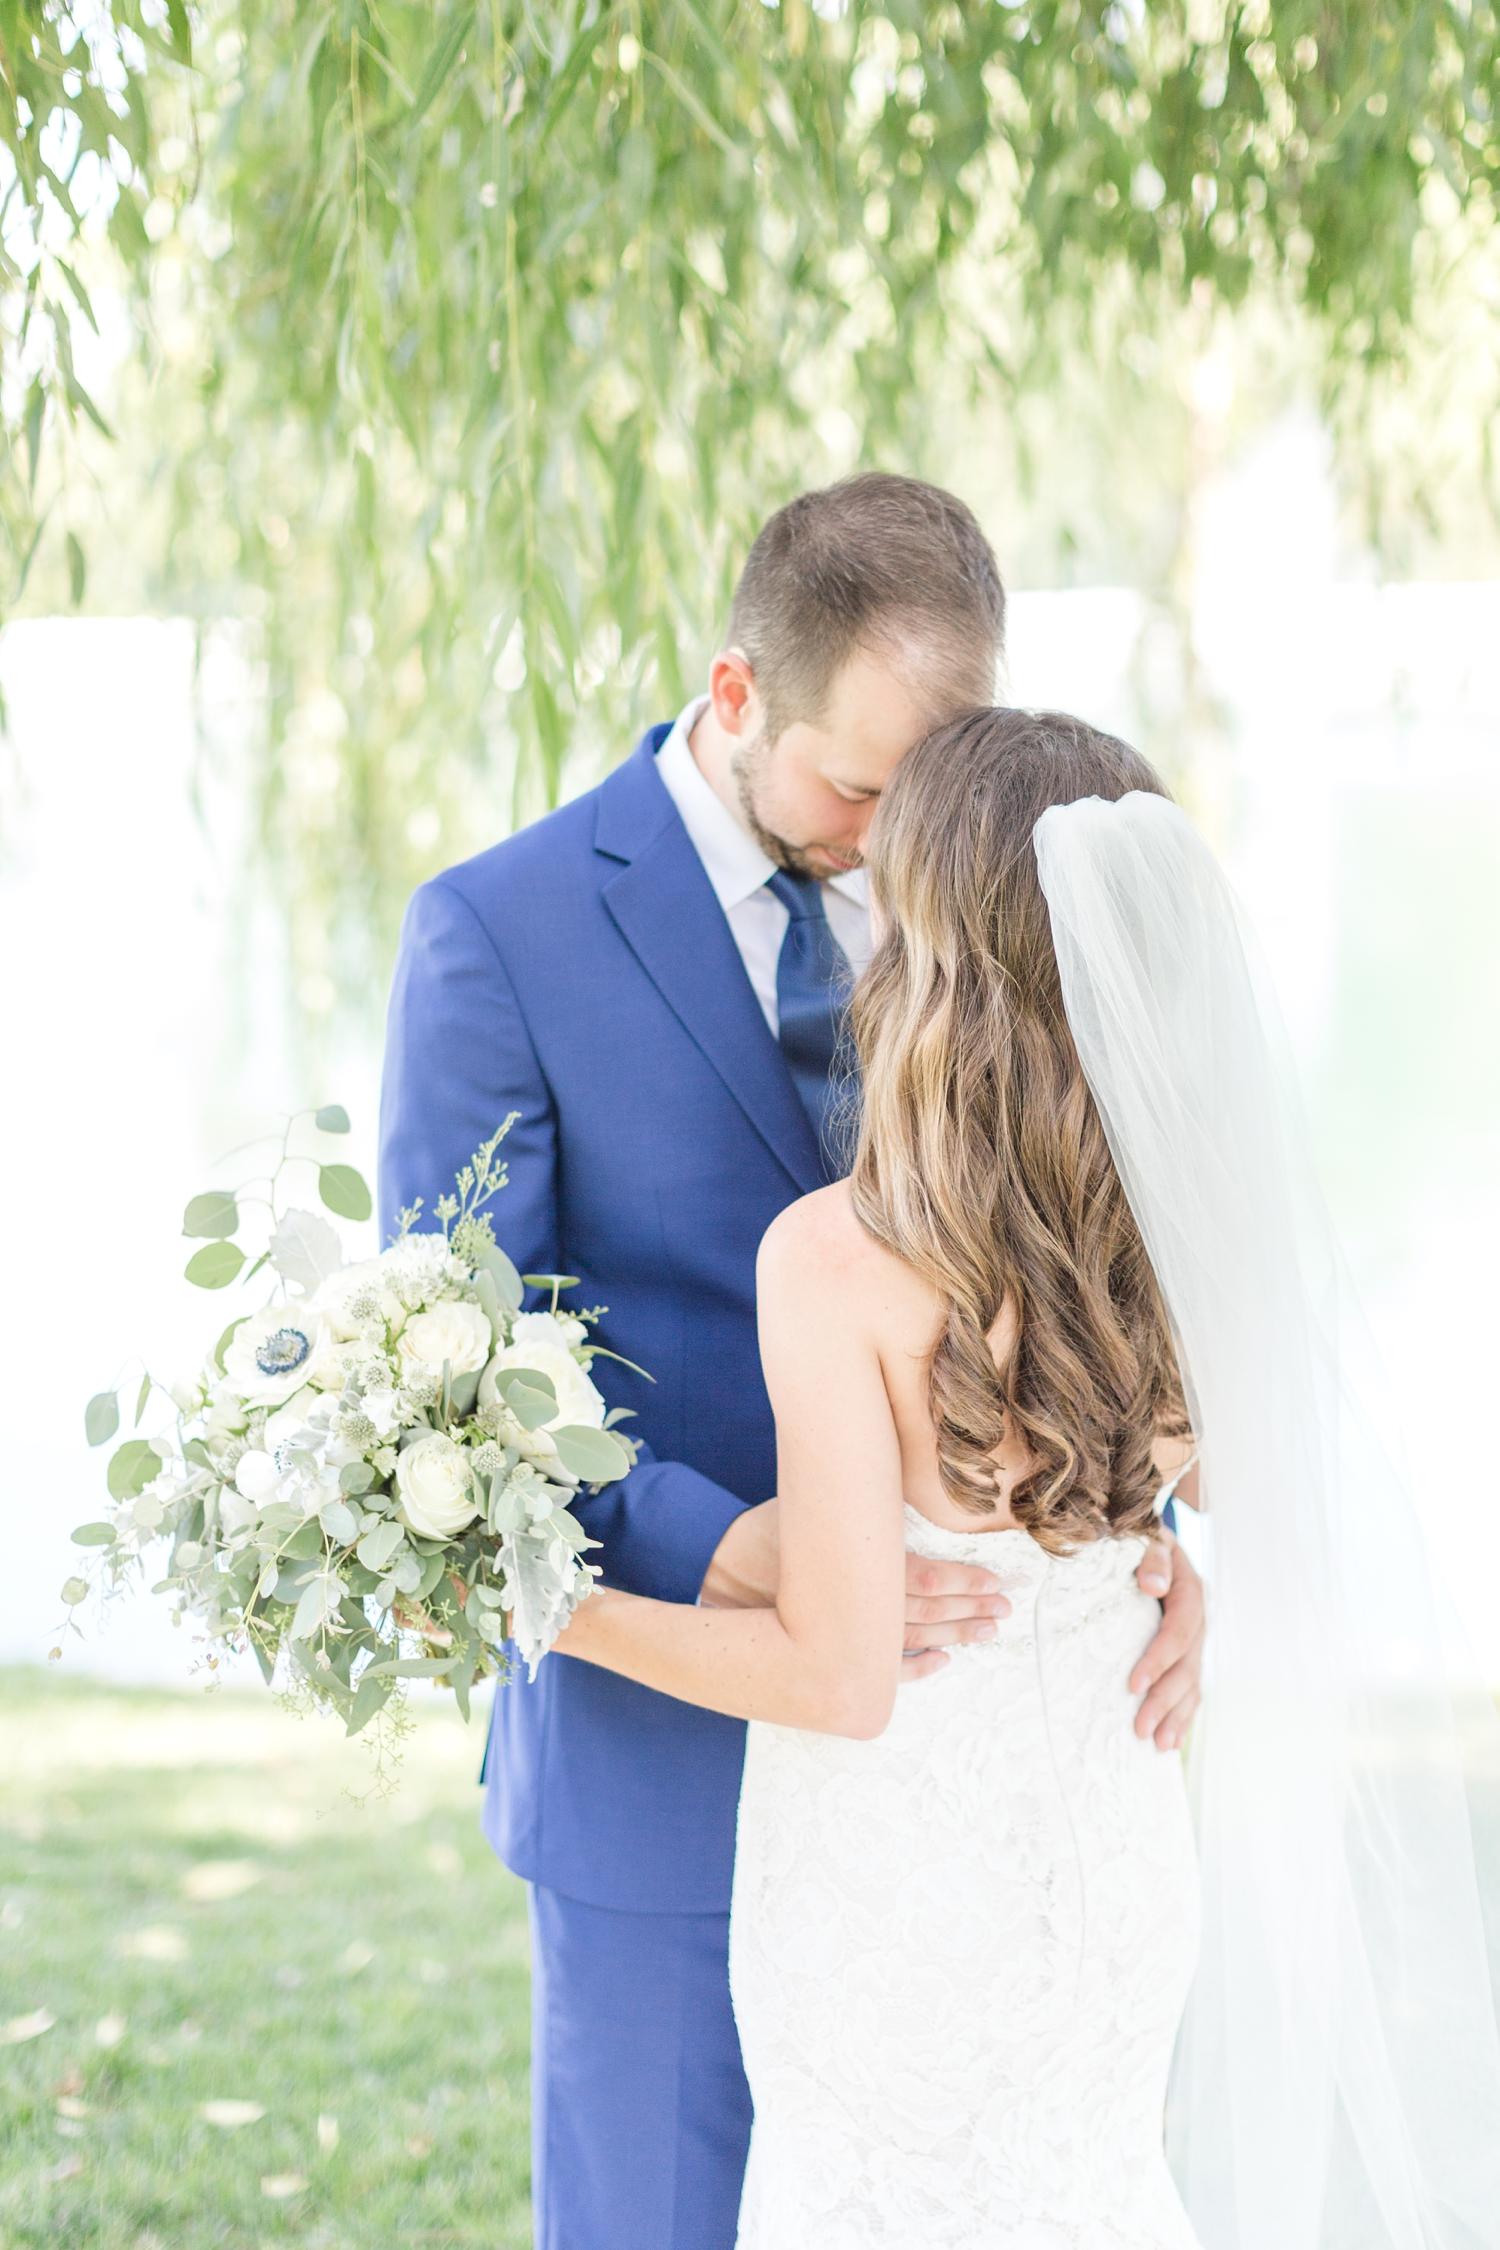 Webb WEDDING HIGHLIGHTS-127_Pond-View-Farm-wedding-Maryland-wedding-photographer-anna-grace-photography-photo.jpg